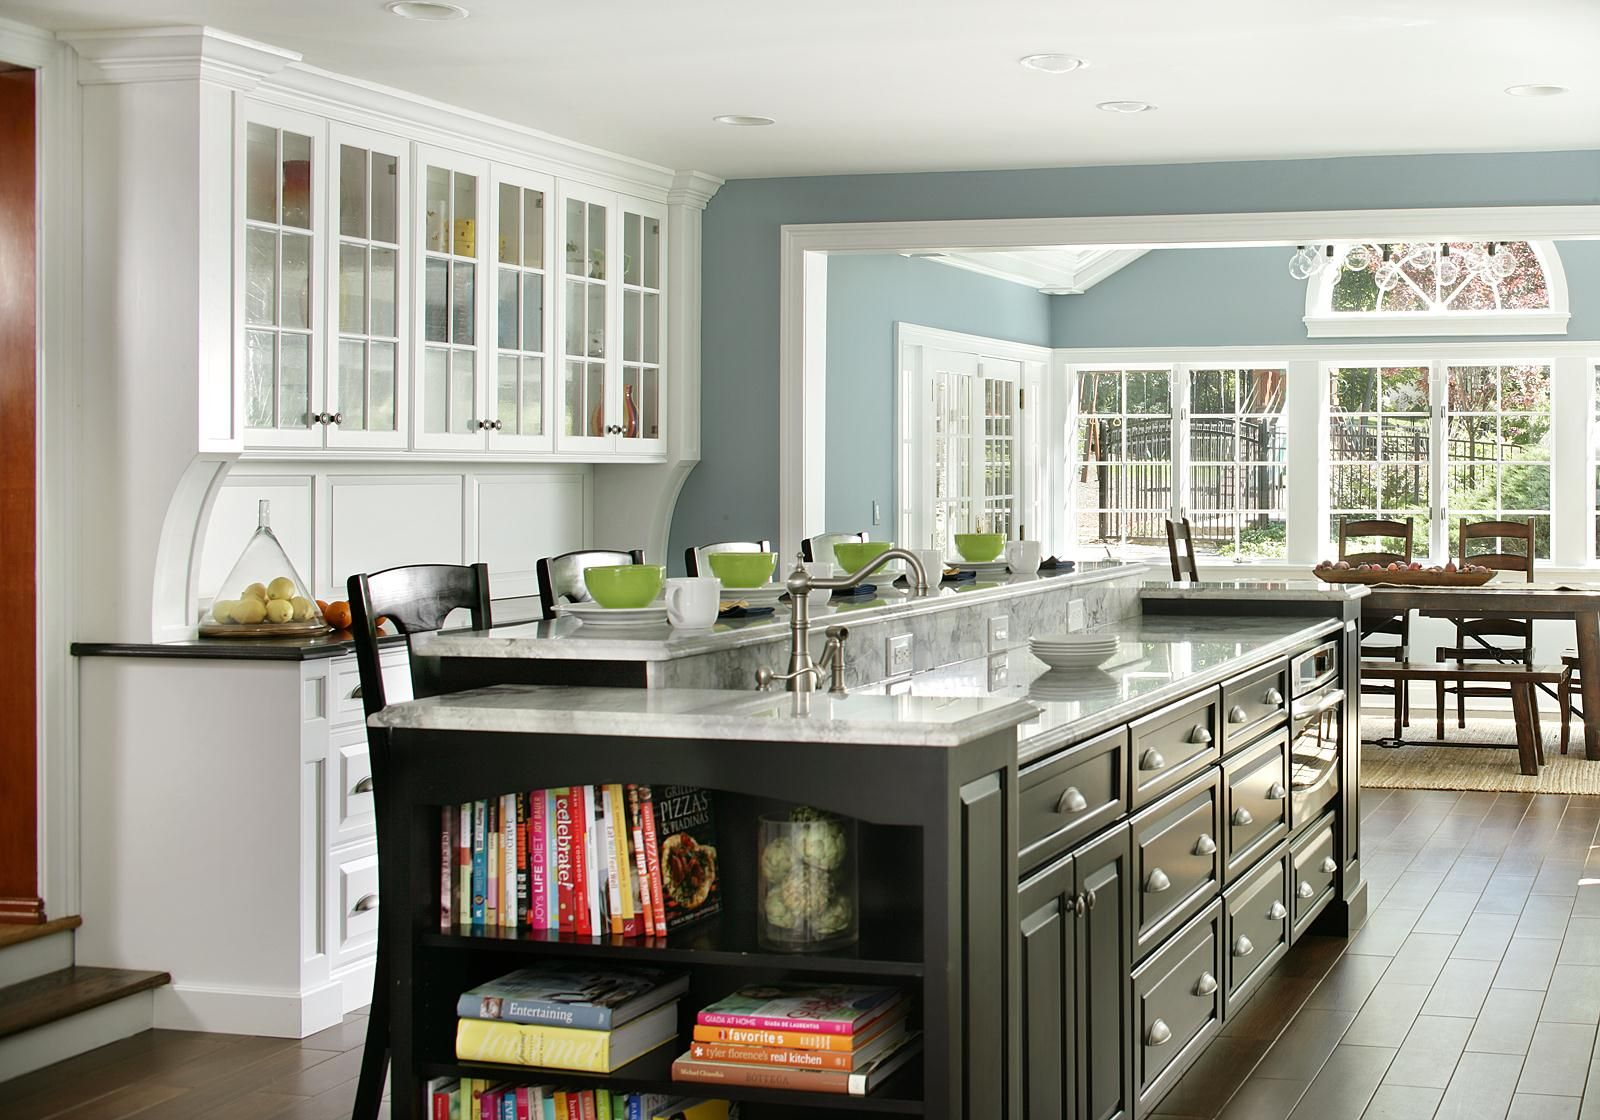 Kitchen | Kitchen ideas | Pinterest